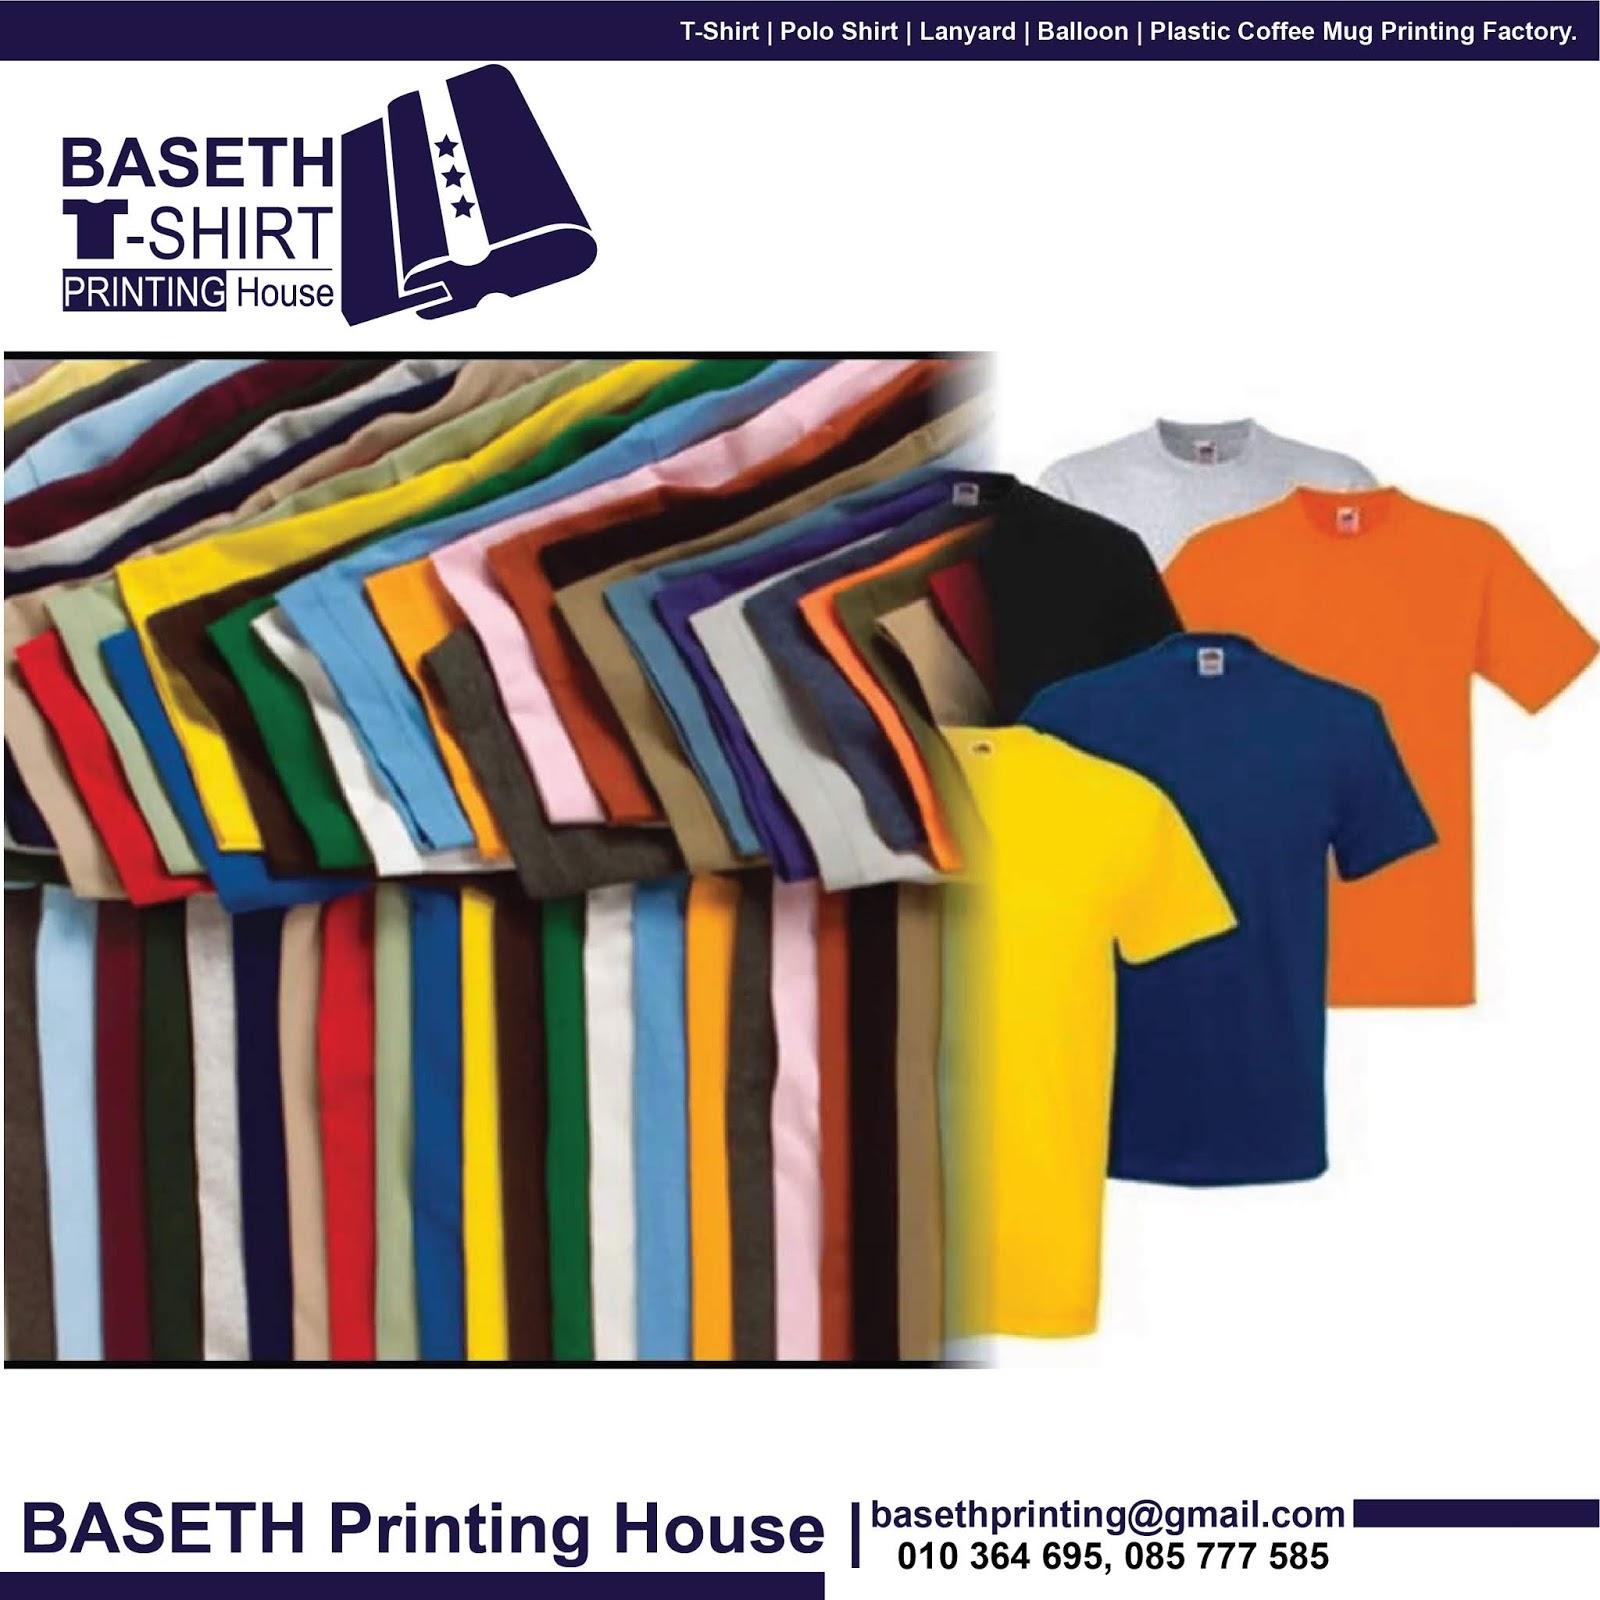 Basetht Shirt Printing House Wholesale Manufacture T Shirt Polo